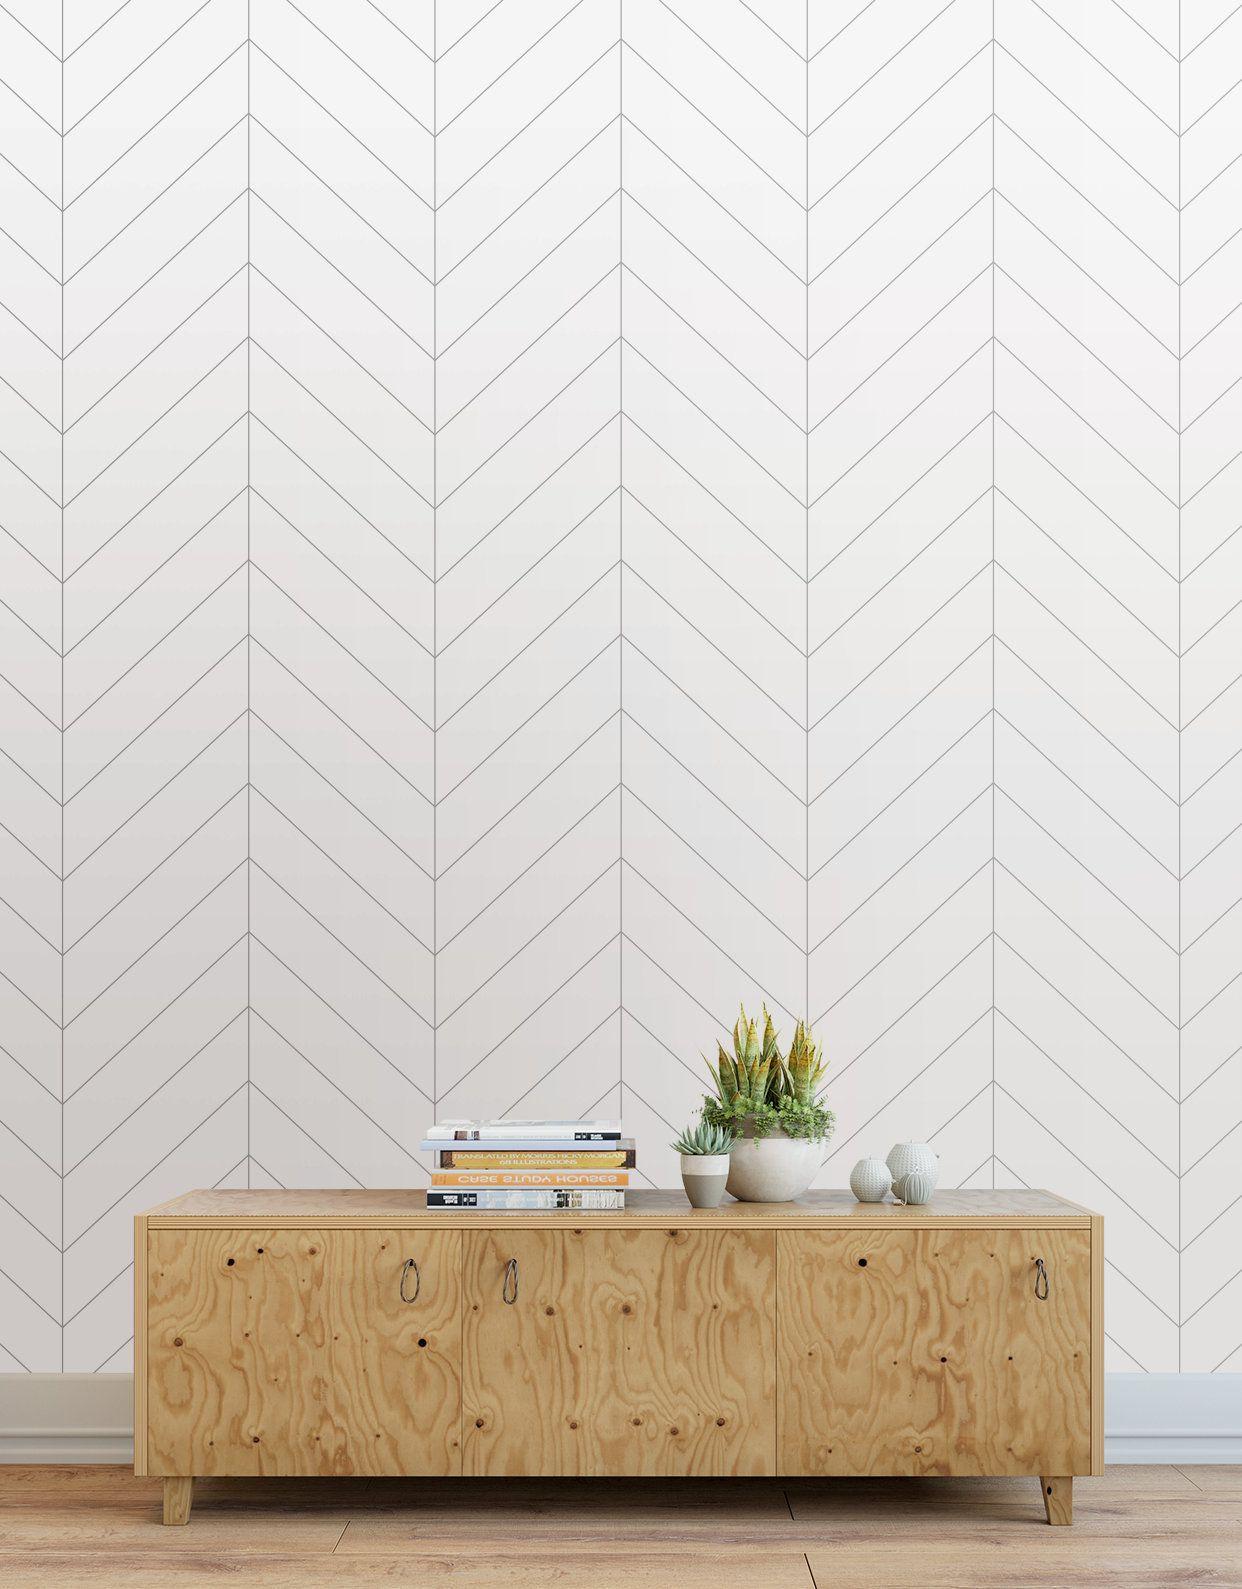 Chevrons Wallpaper Peler Et Coller Moderne Papier Peint Herringbone Wallpaper Feature Wall Wallpaper Master Bedroom Wallpaper